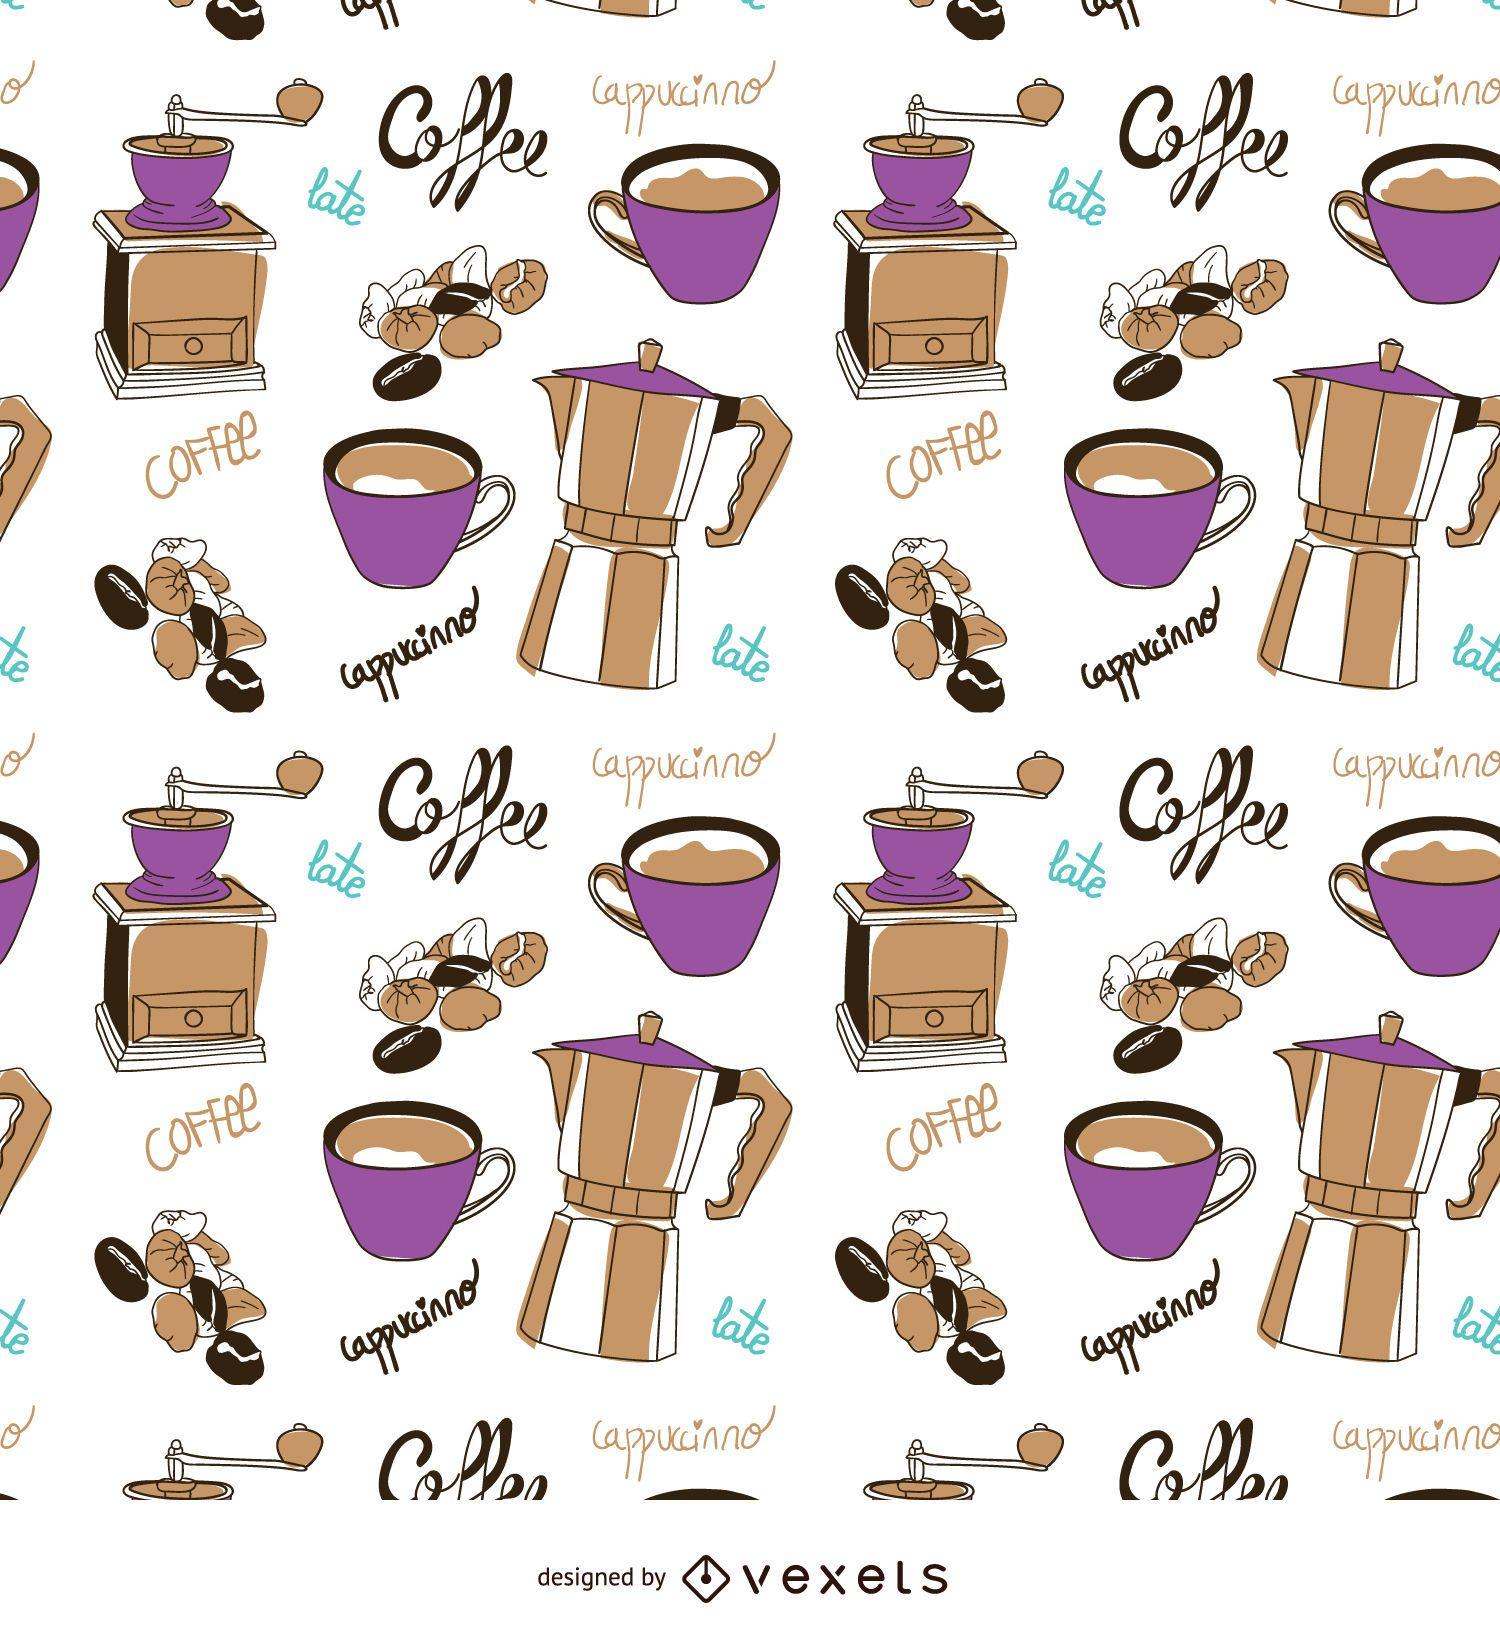 Coffee elements hand-drawn pattern